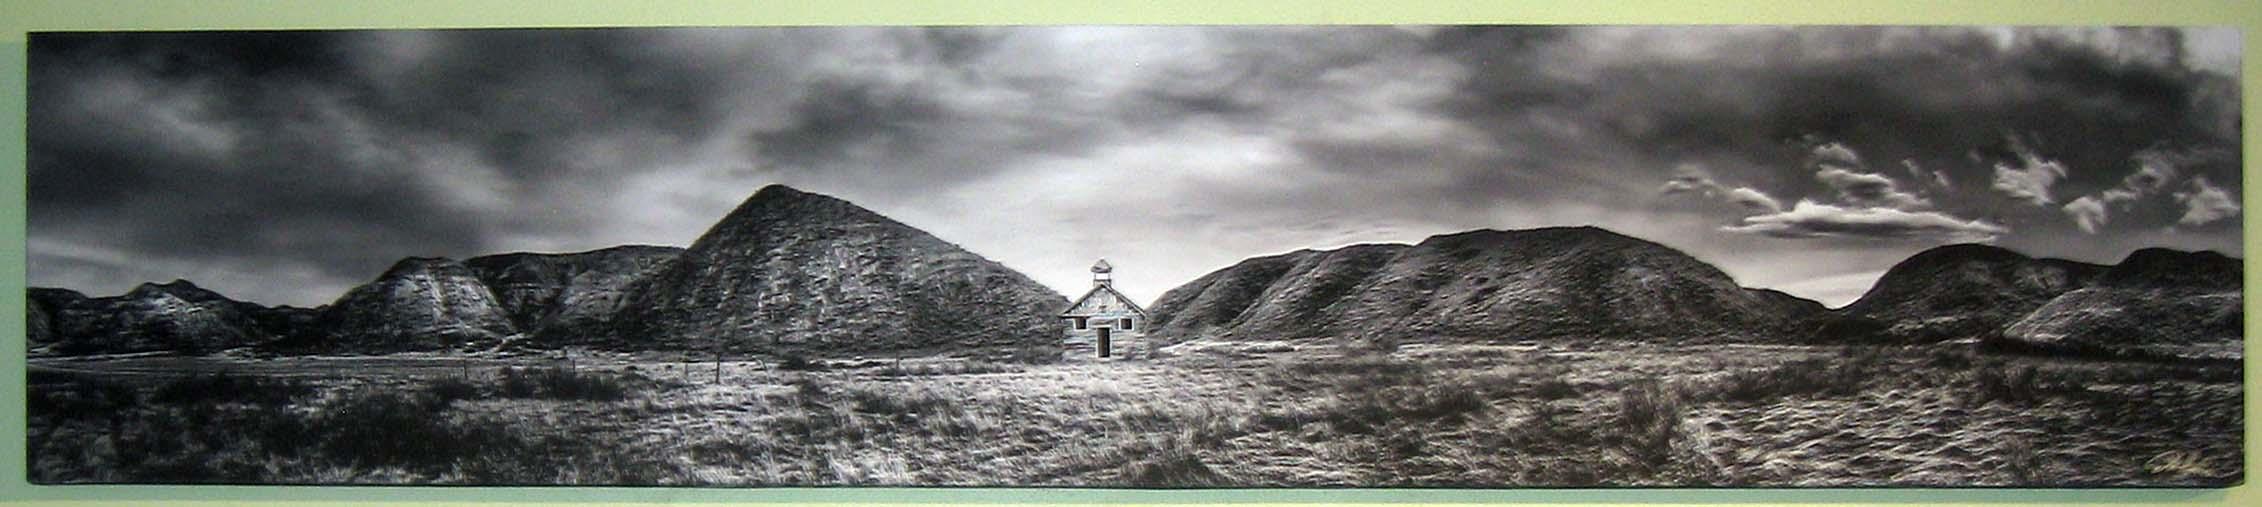 © Hirsch (2) photograph on canvas